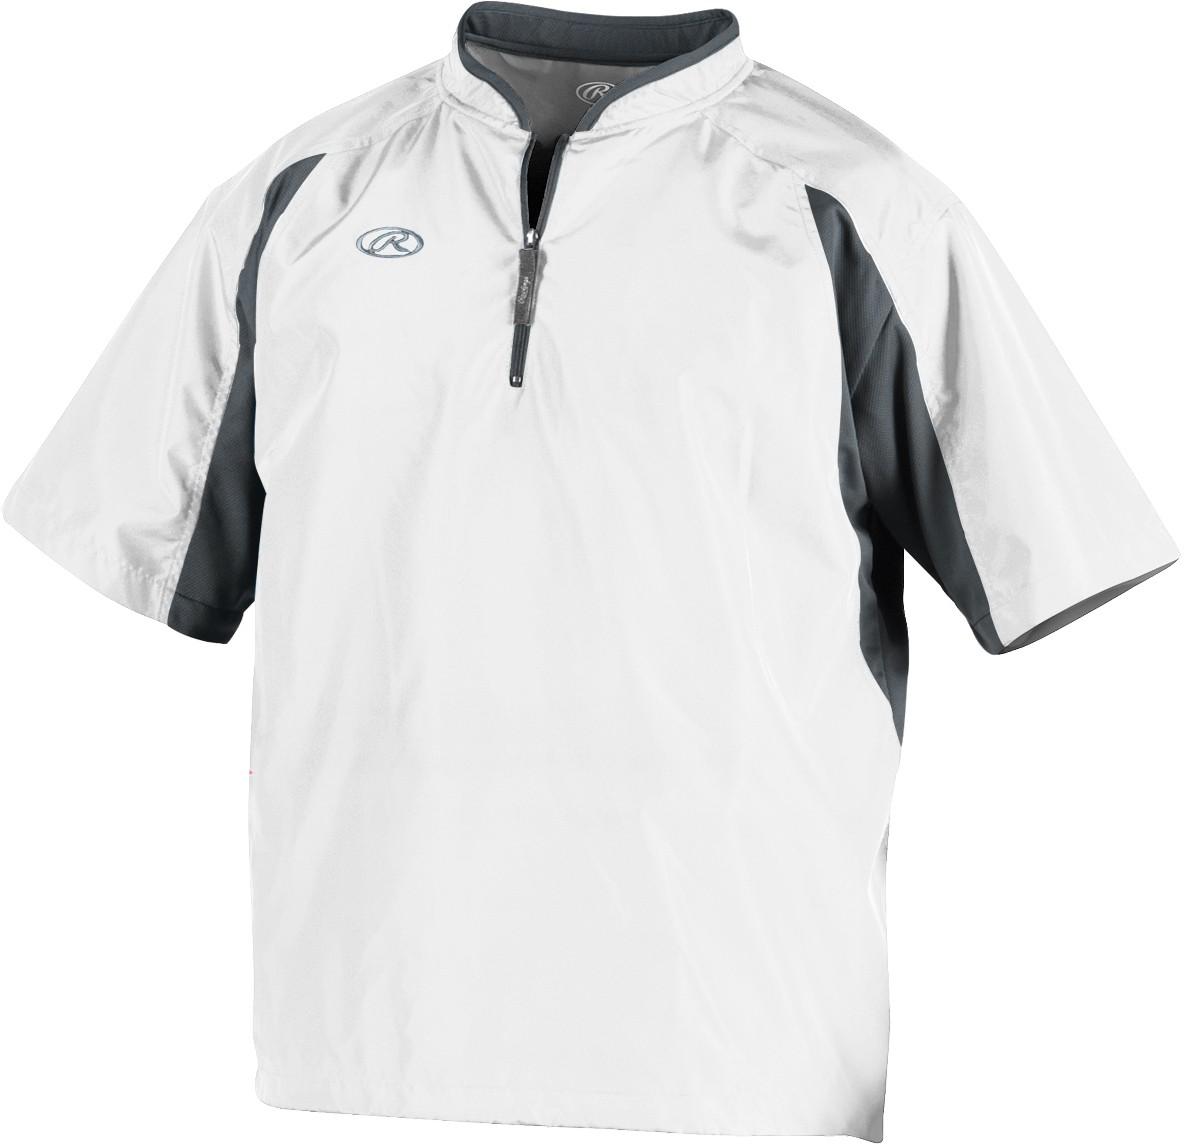 pretty nice b28e2 900f7 Rawlings Baseball Short Sleeve Cage Jacket, TOCCJ